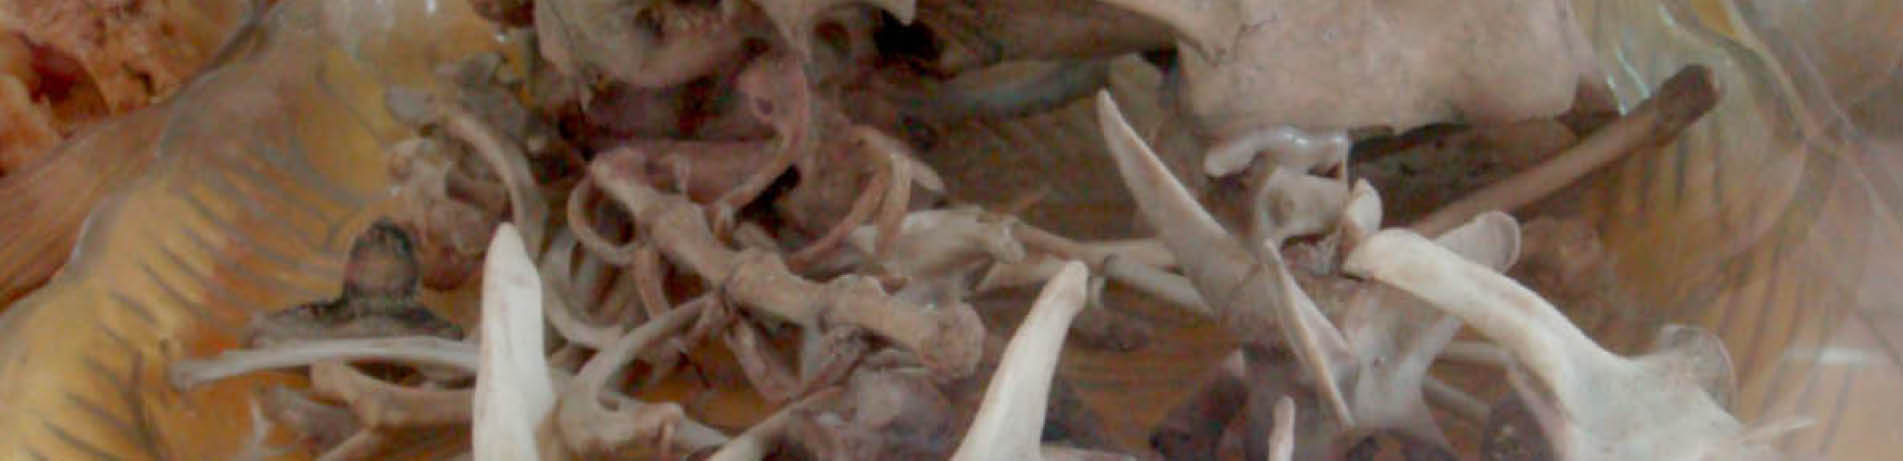 Pieces of leopard bone